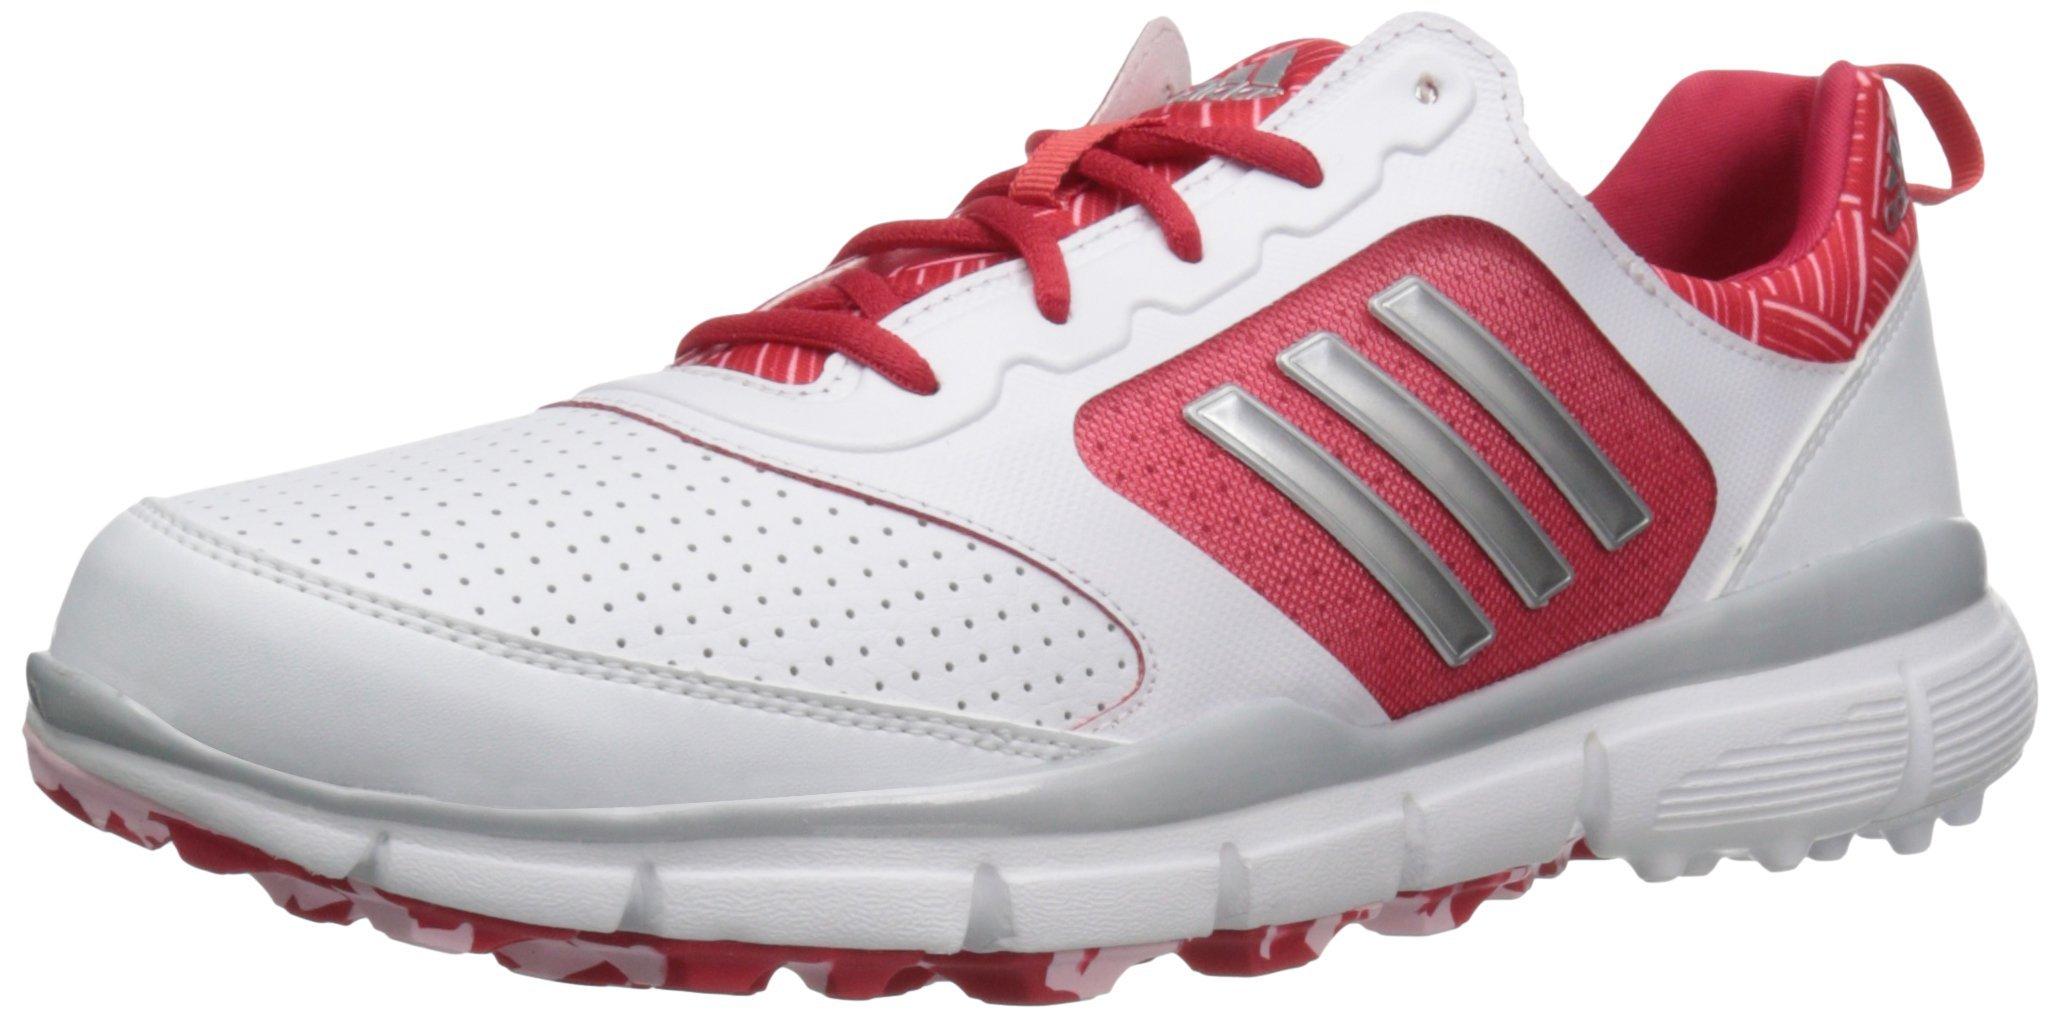 adidas Women's W Adistar Sport Golf Shoe, Fatwa White/Matte Silver/Ray Red Fabric, 9 M US